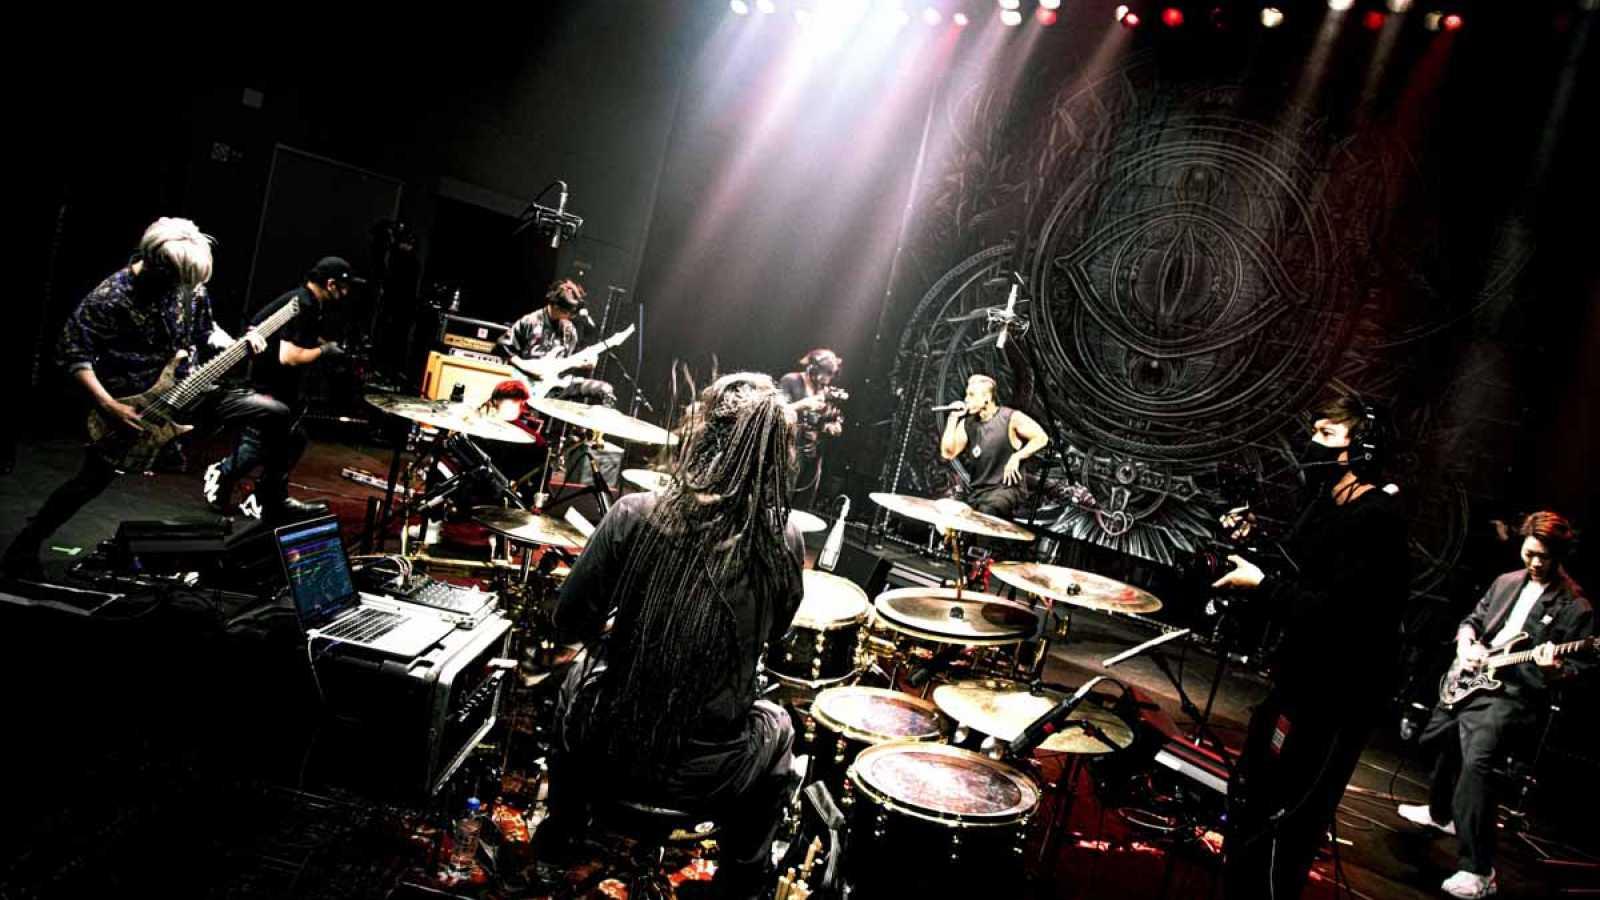 Details on NOCTURNAL BLOODLUST's First Streaming Concert © NOCTURNAL BLOODLUST. All rights reserved.